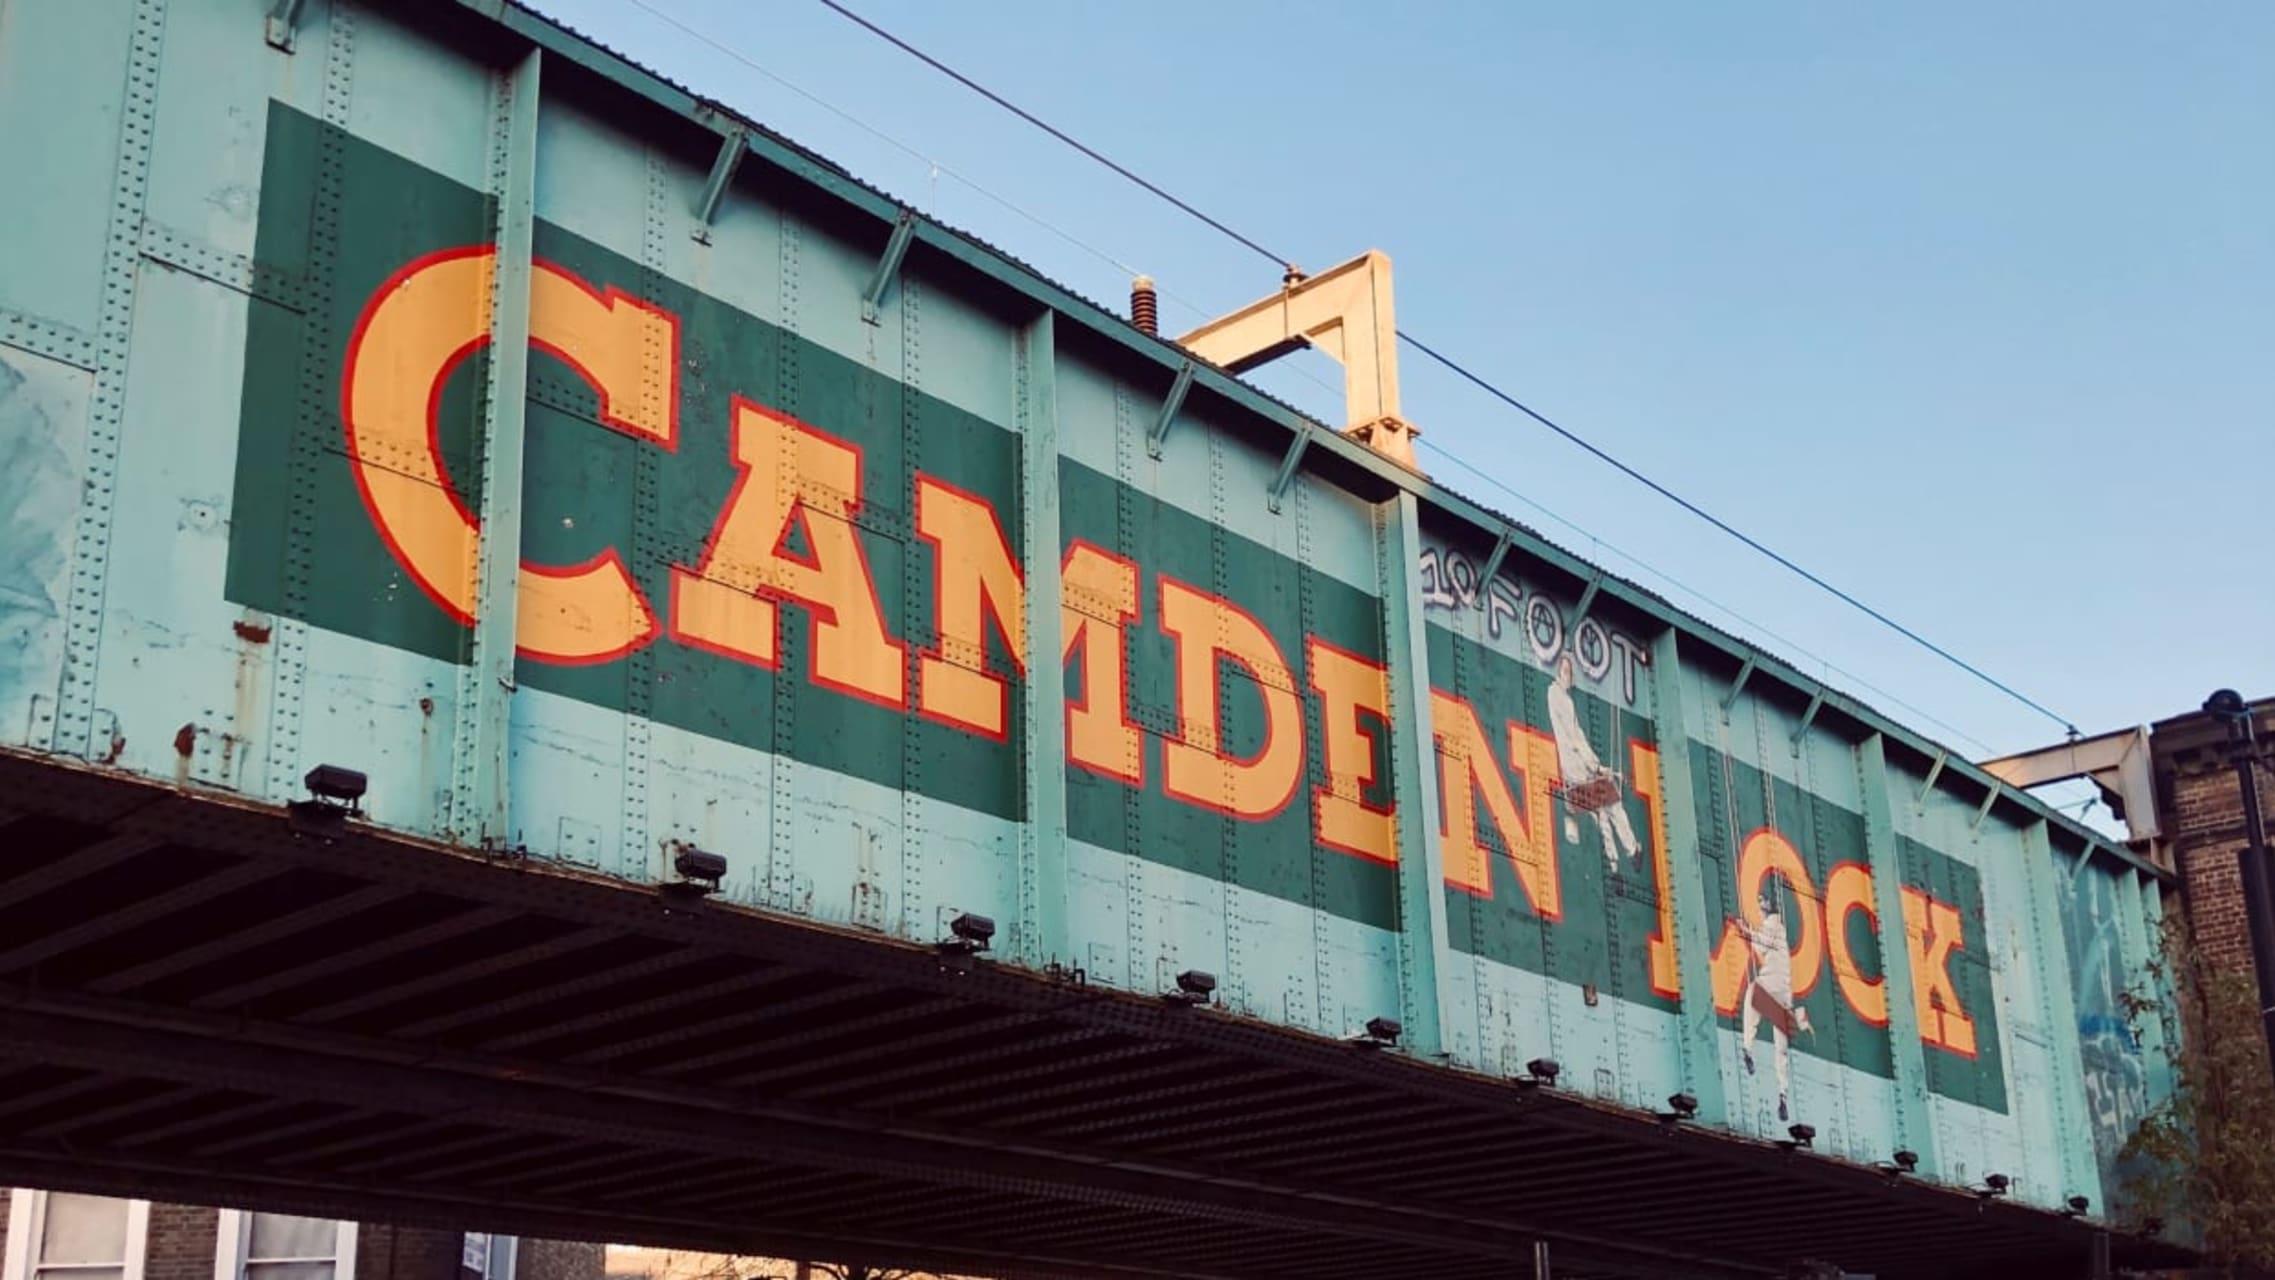 London - Camden Town: Le Quartier Punk (TOUR IN FRENCH)